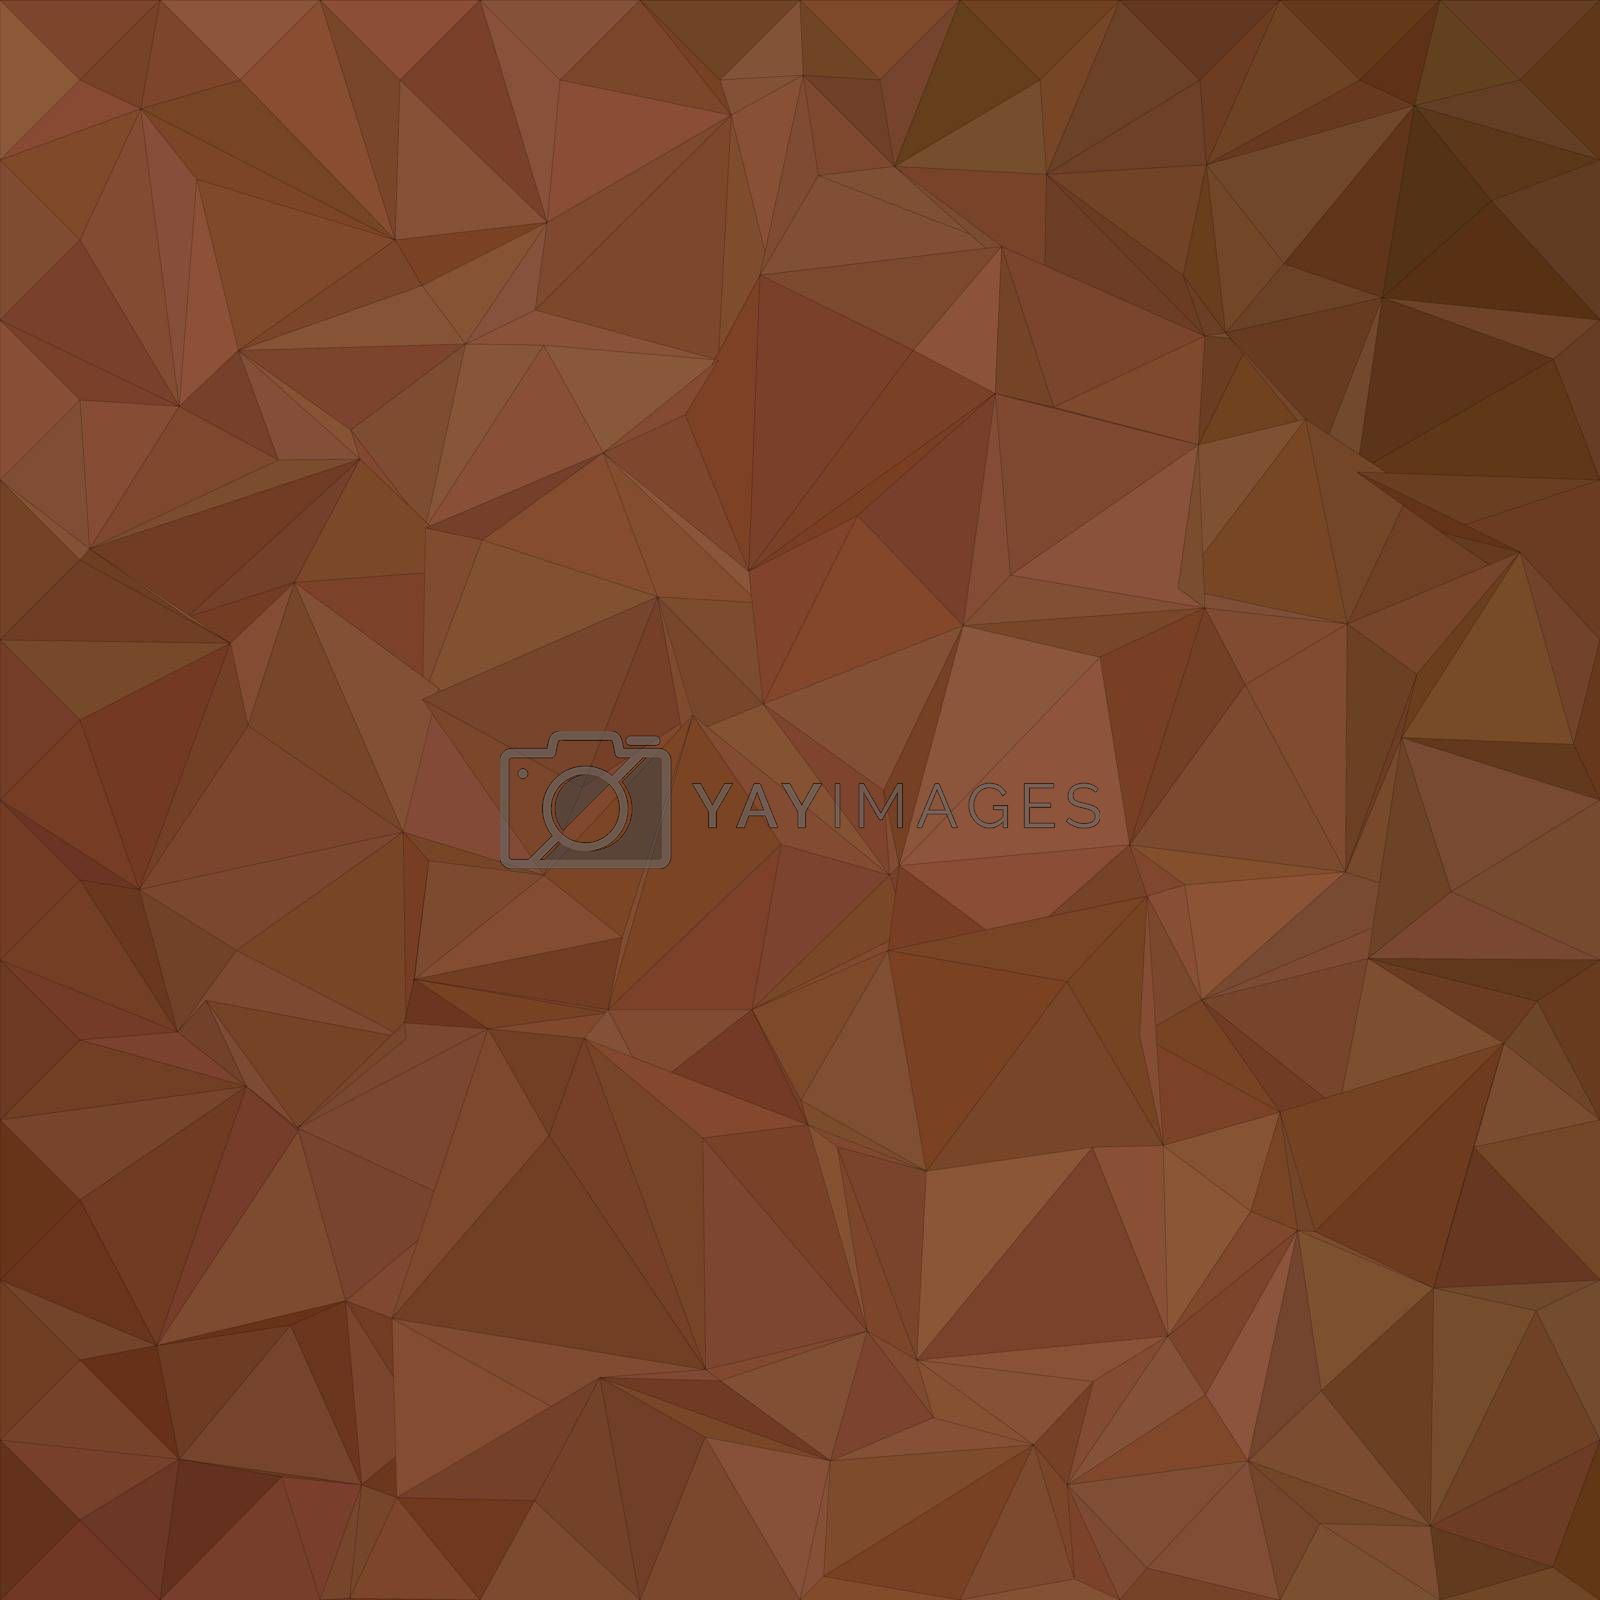 Brown irregular triangle mosaic vector background design